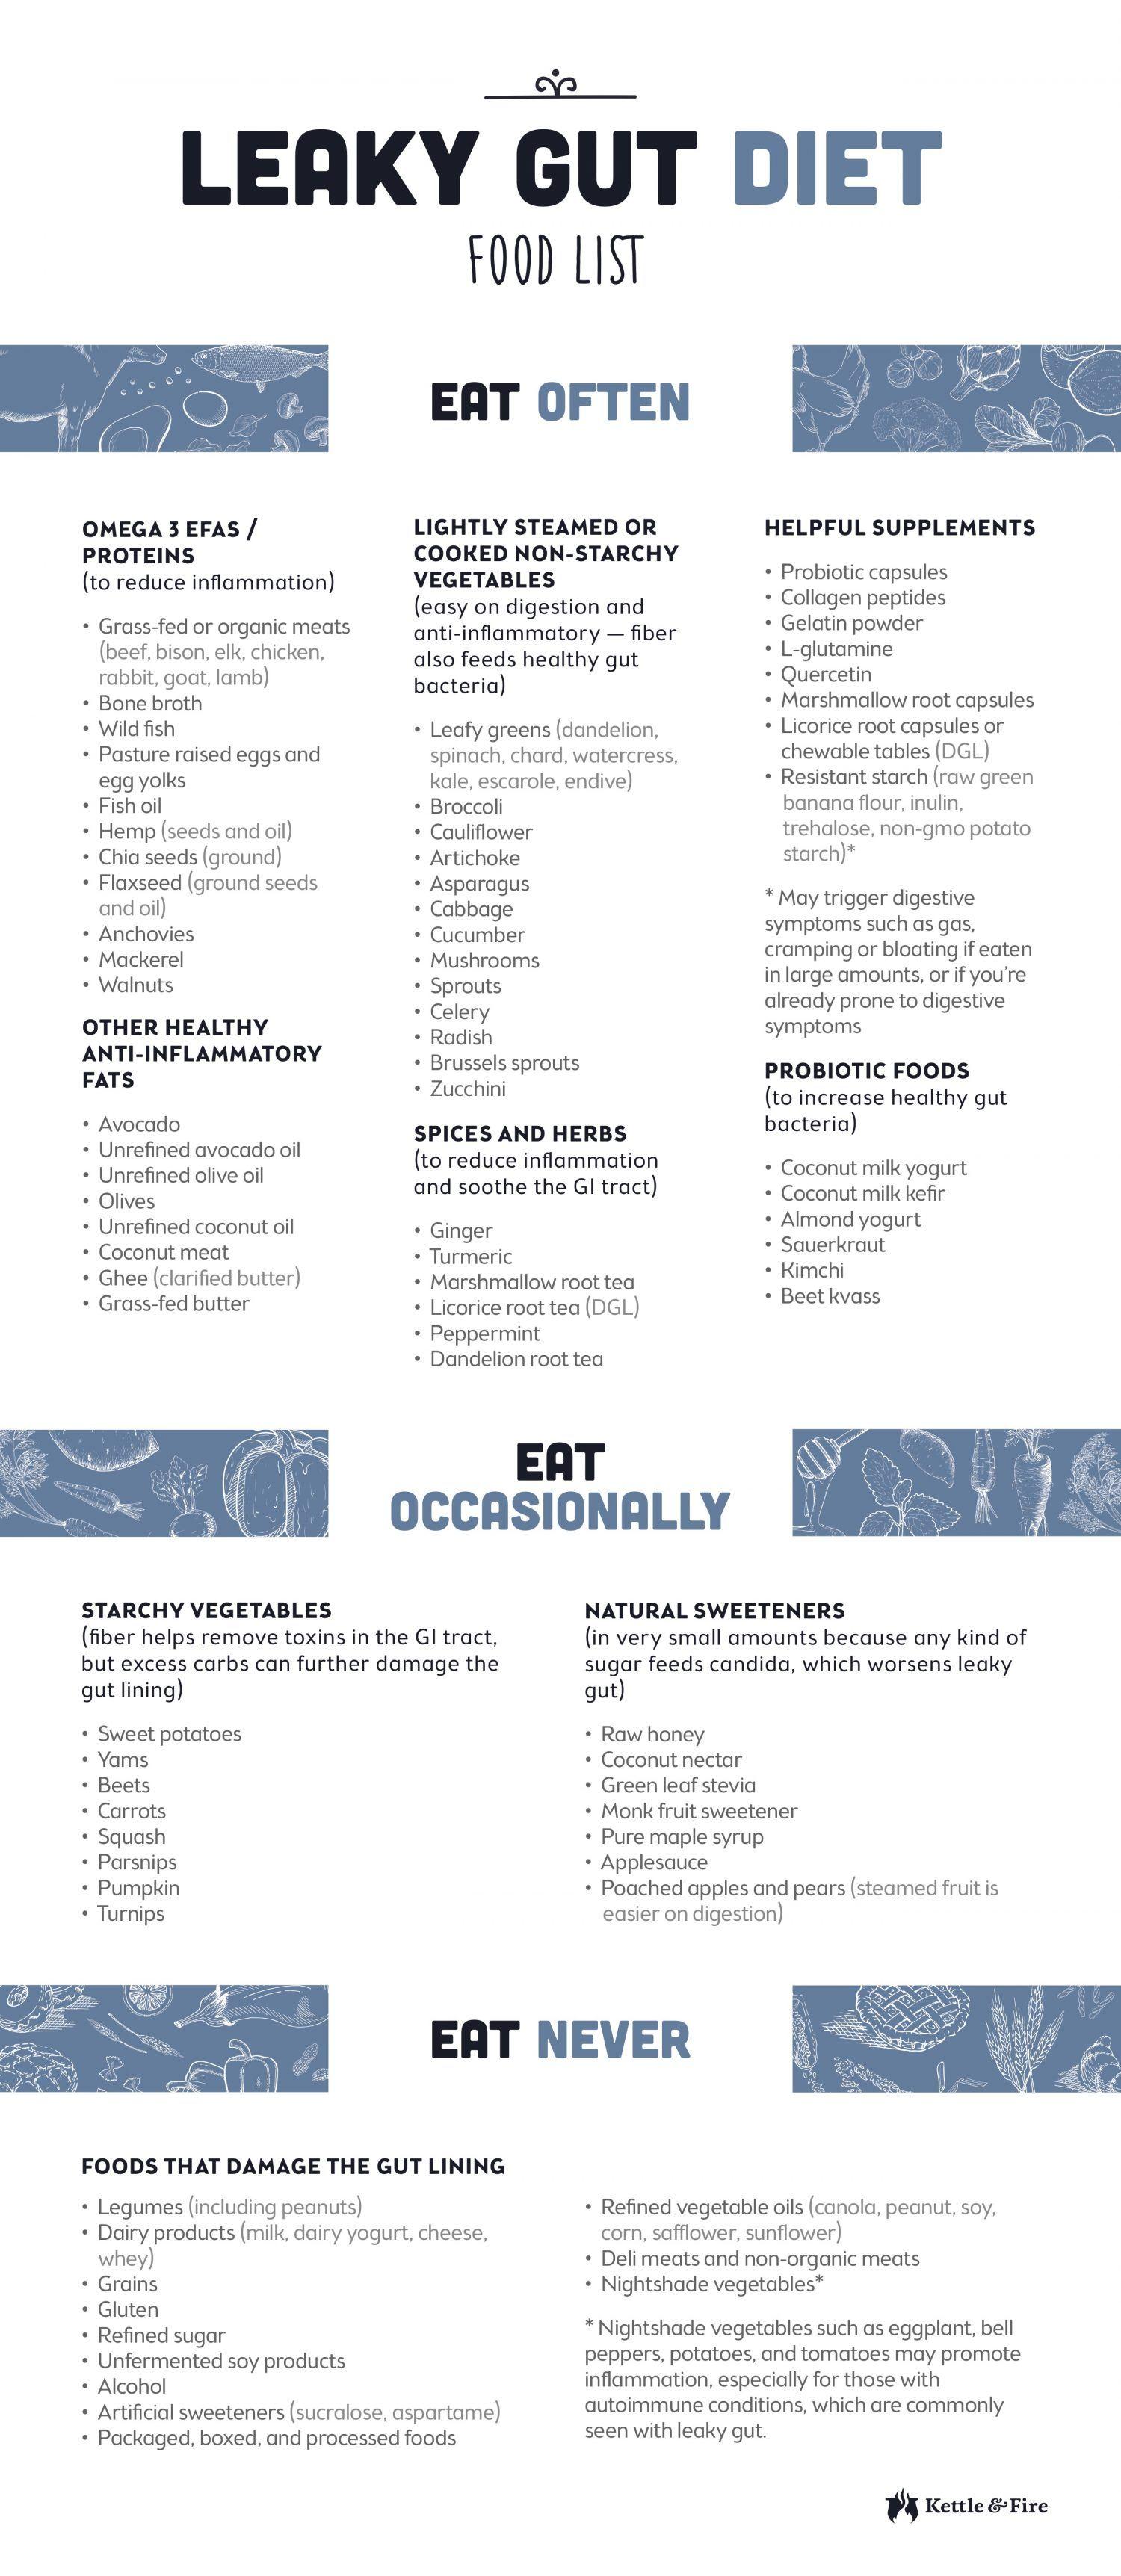 Bone Broth Diet Plan Pdf : broth, Worst, Foods, Healing, Leaky, (Infographic, Diet,, Lists